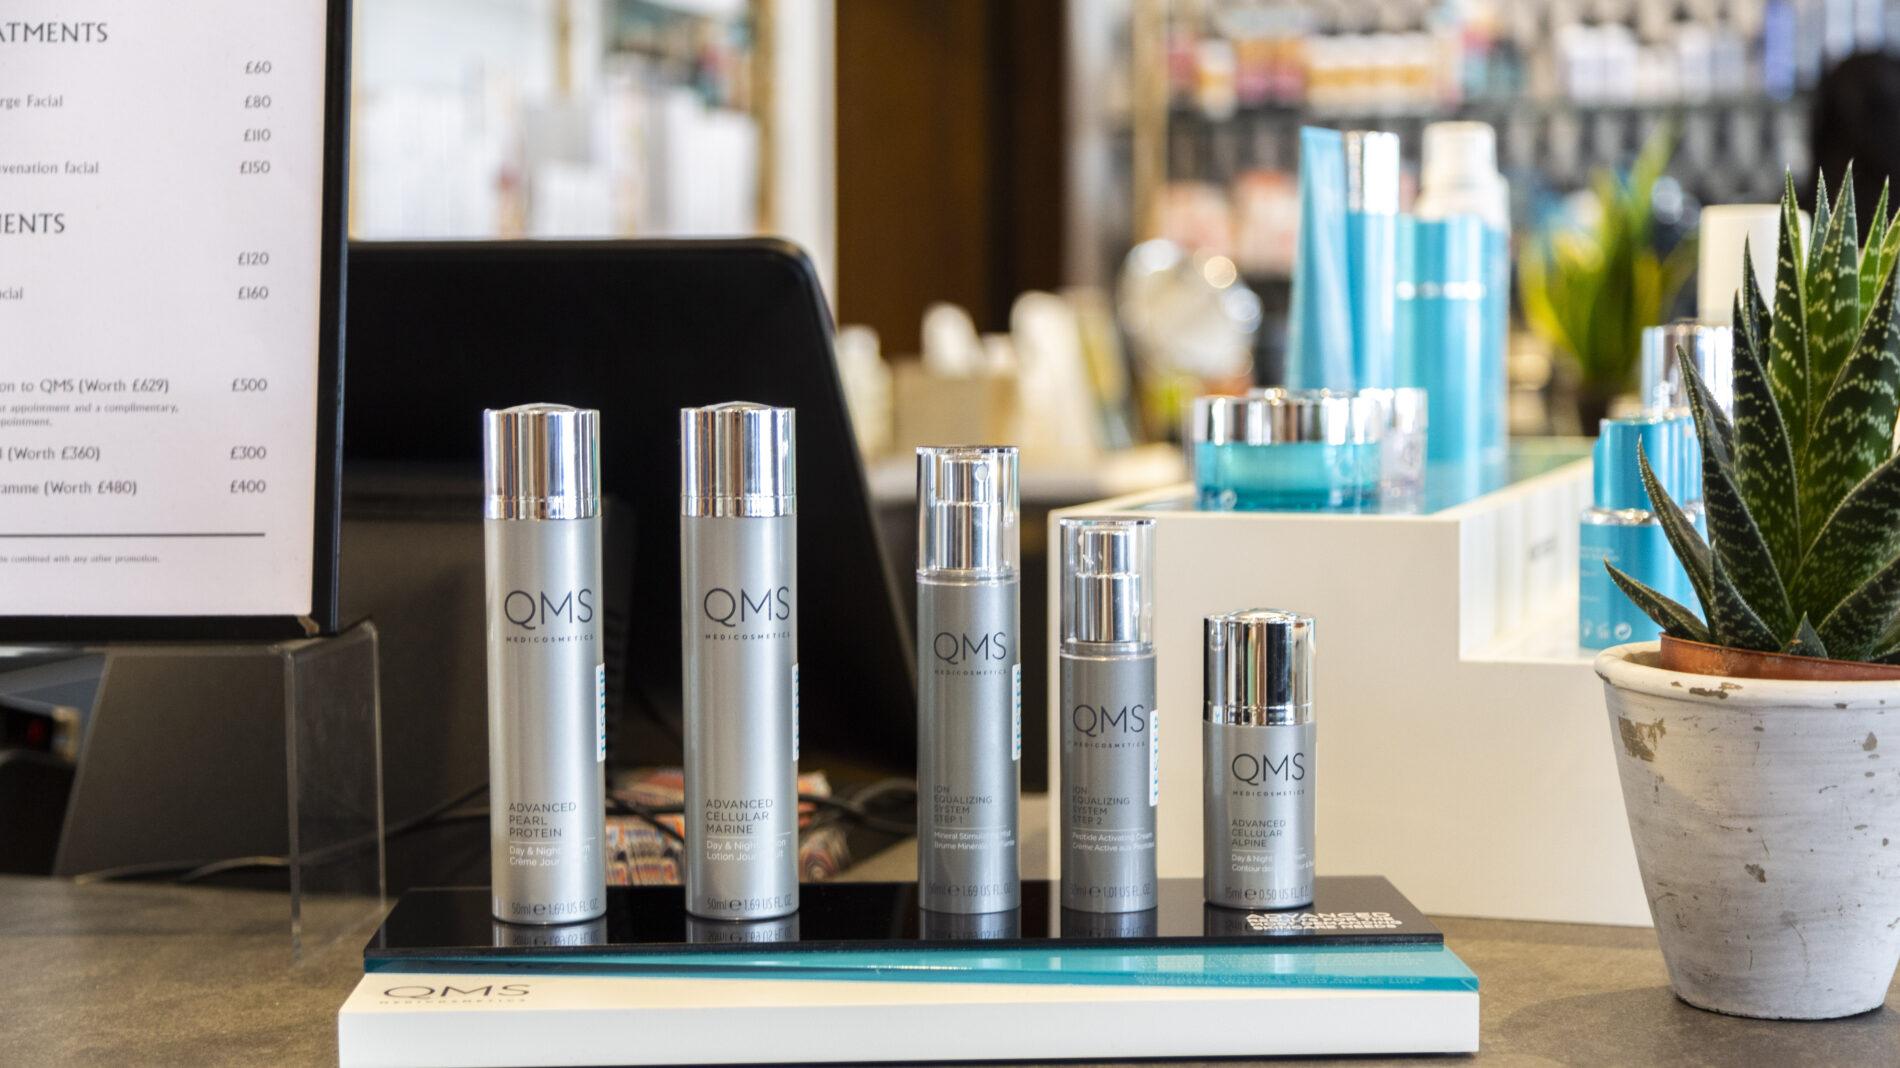 QMS cosmetics table top Liberty's unit